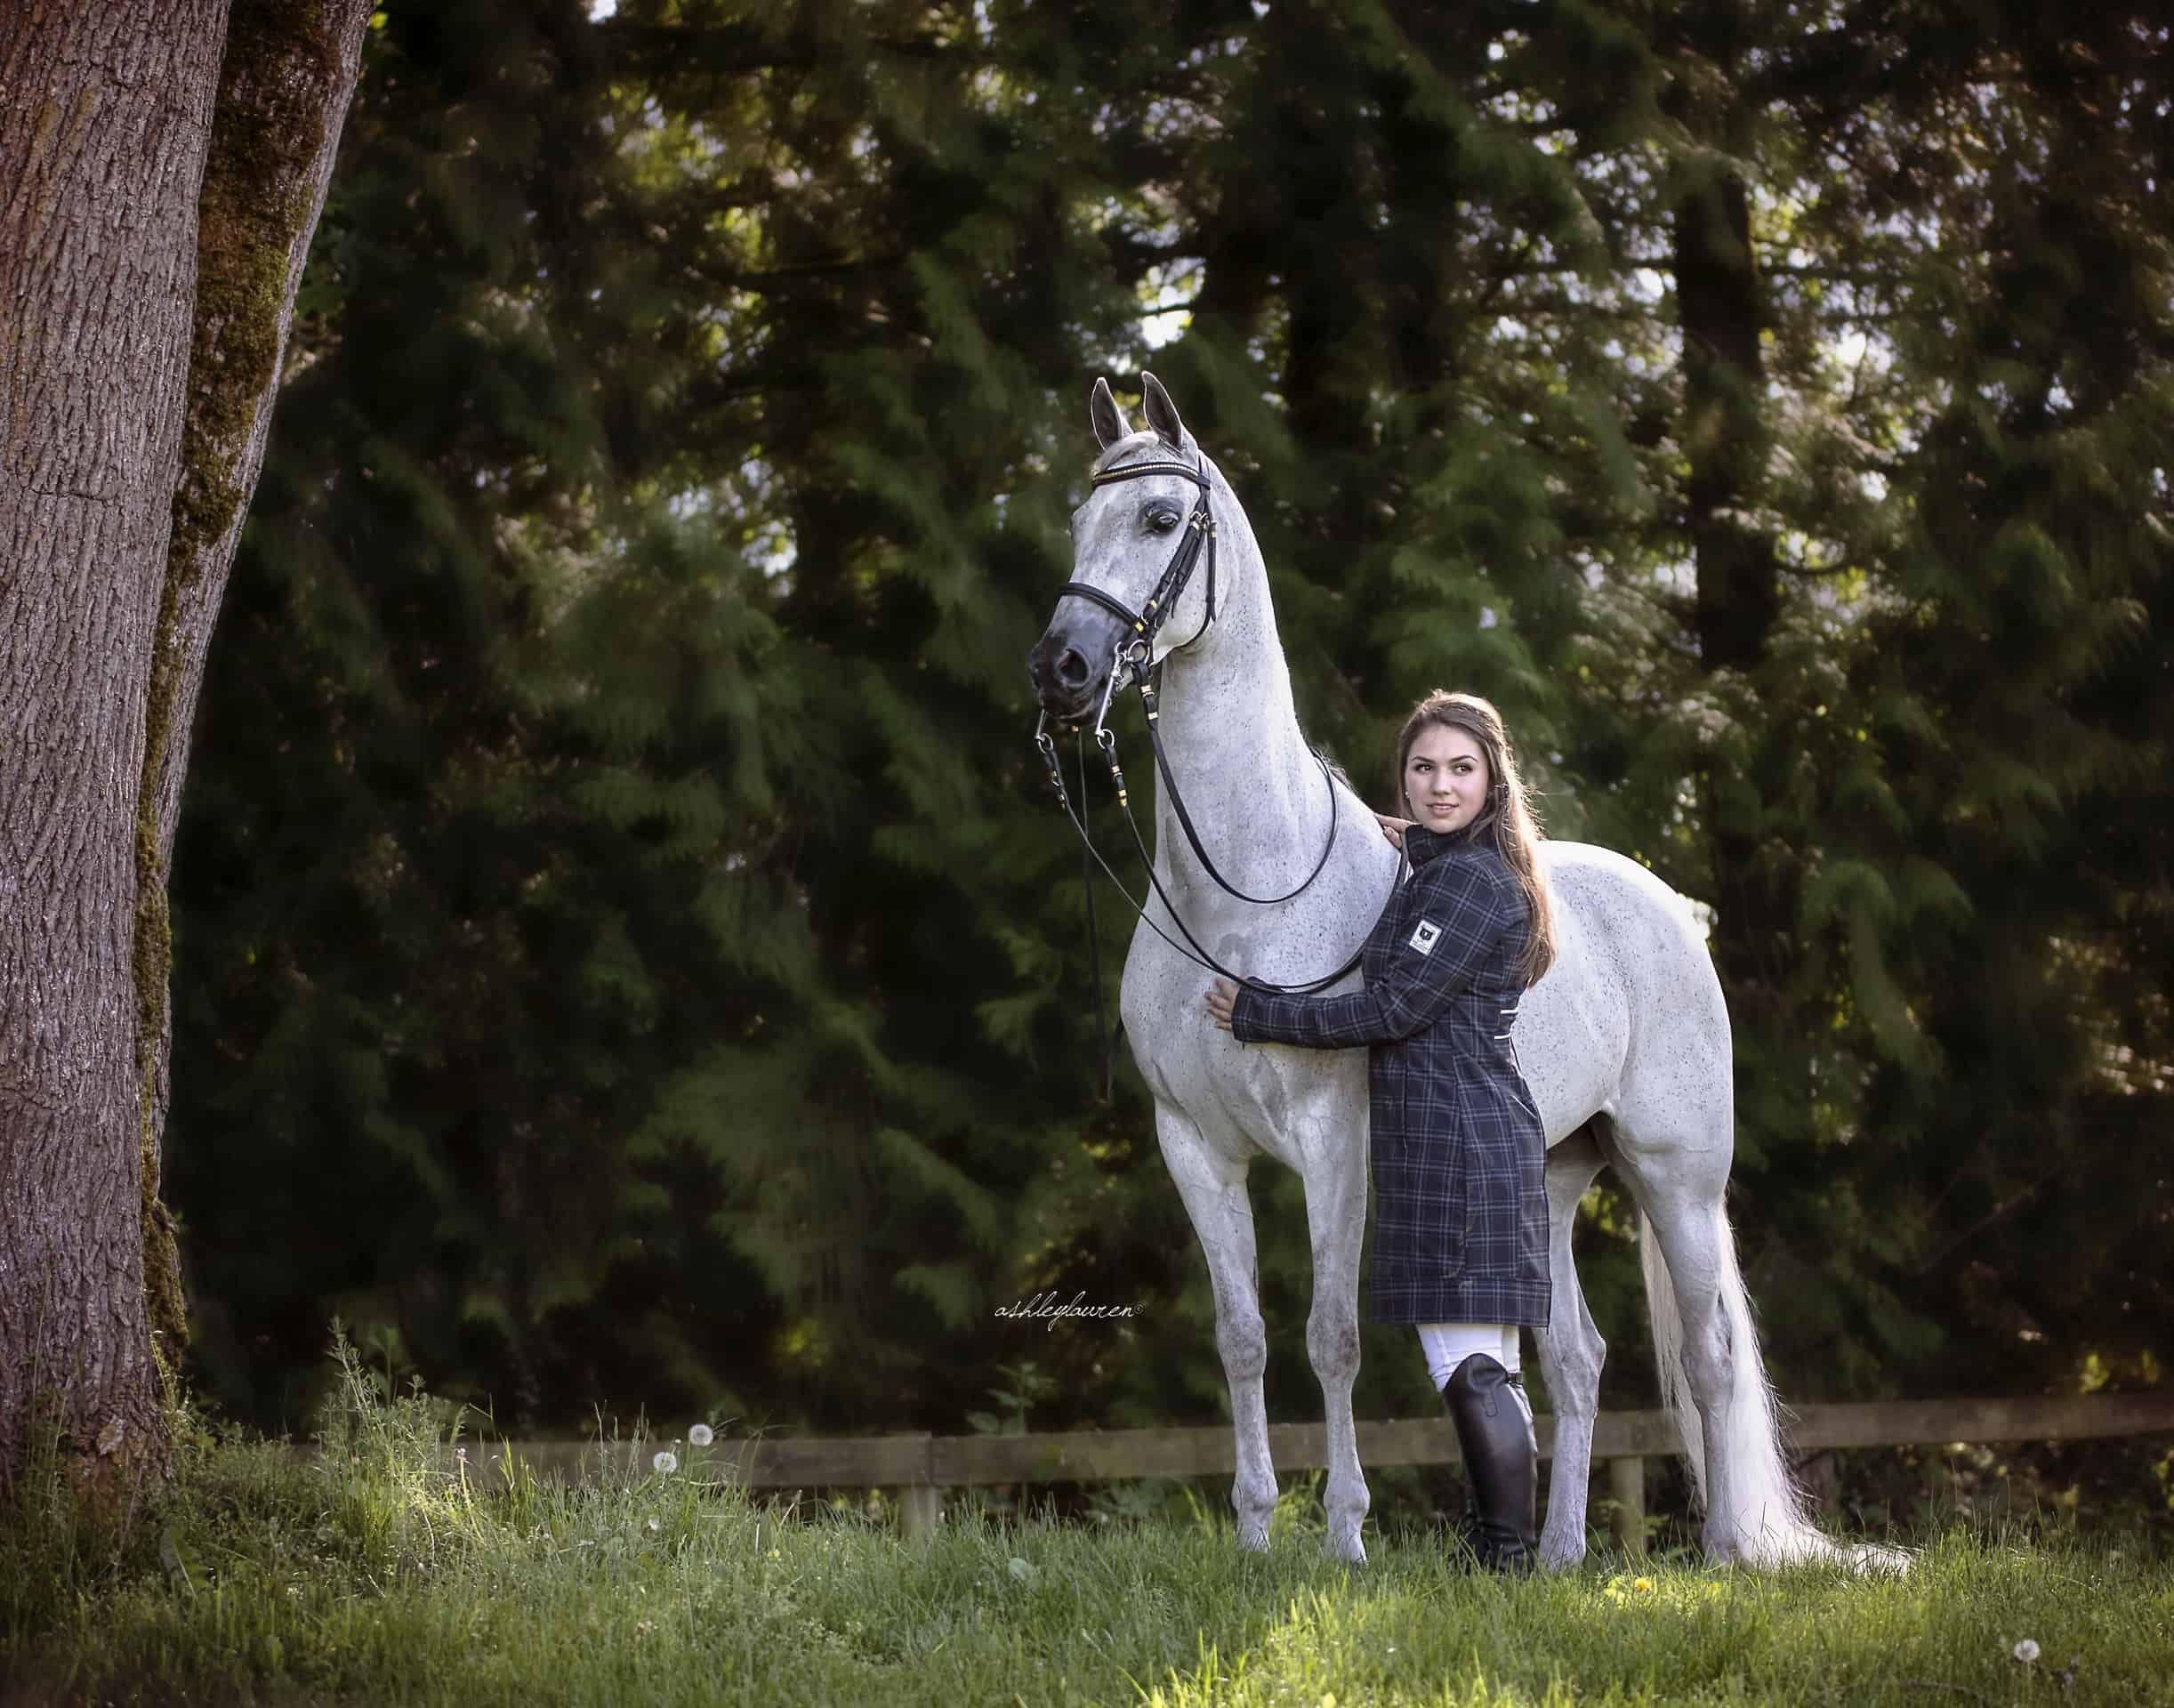 Mission Rider Wins Horse Council Bc S 2015 Junior Athlete